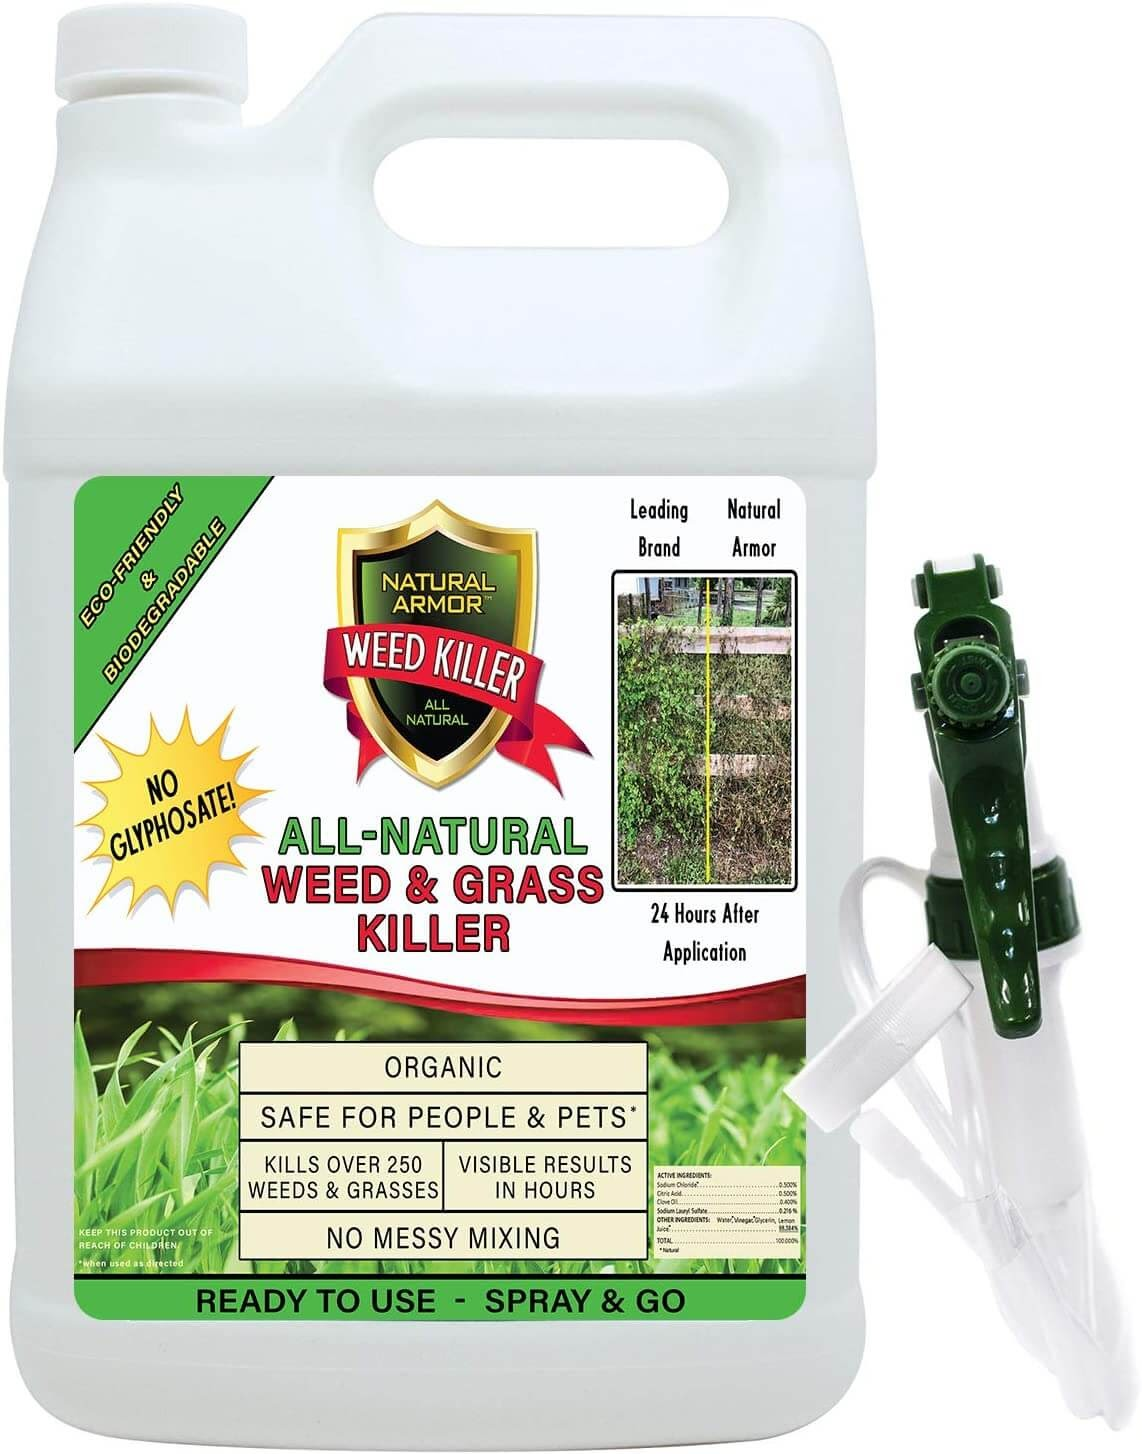 Natural Armor Weed & Grass Killer